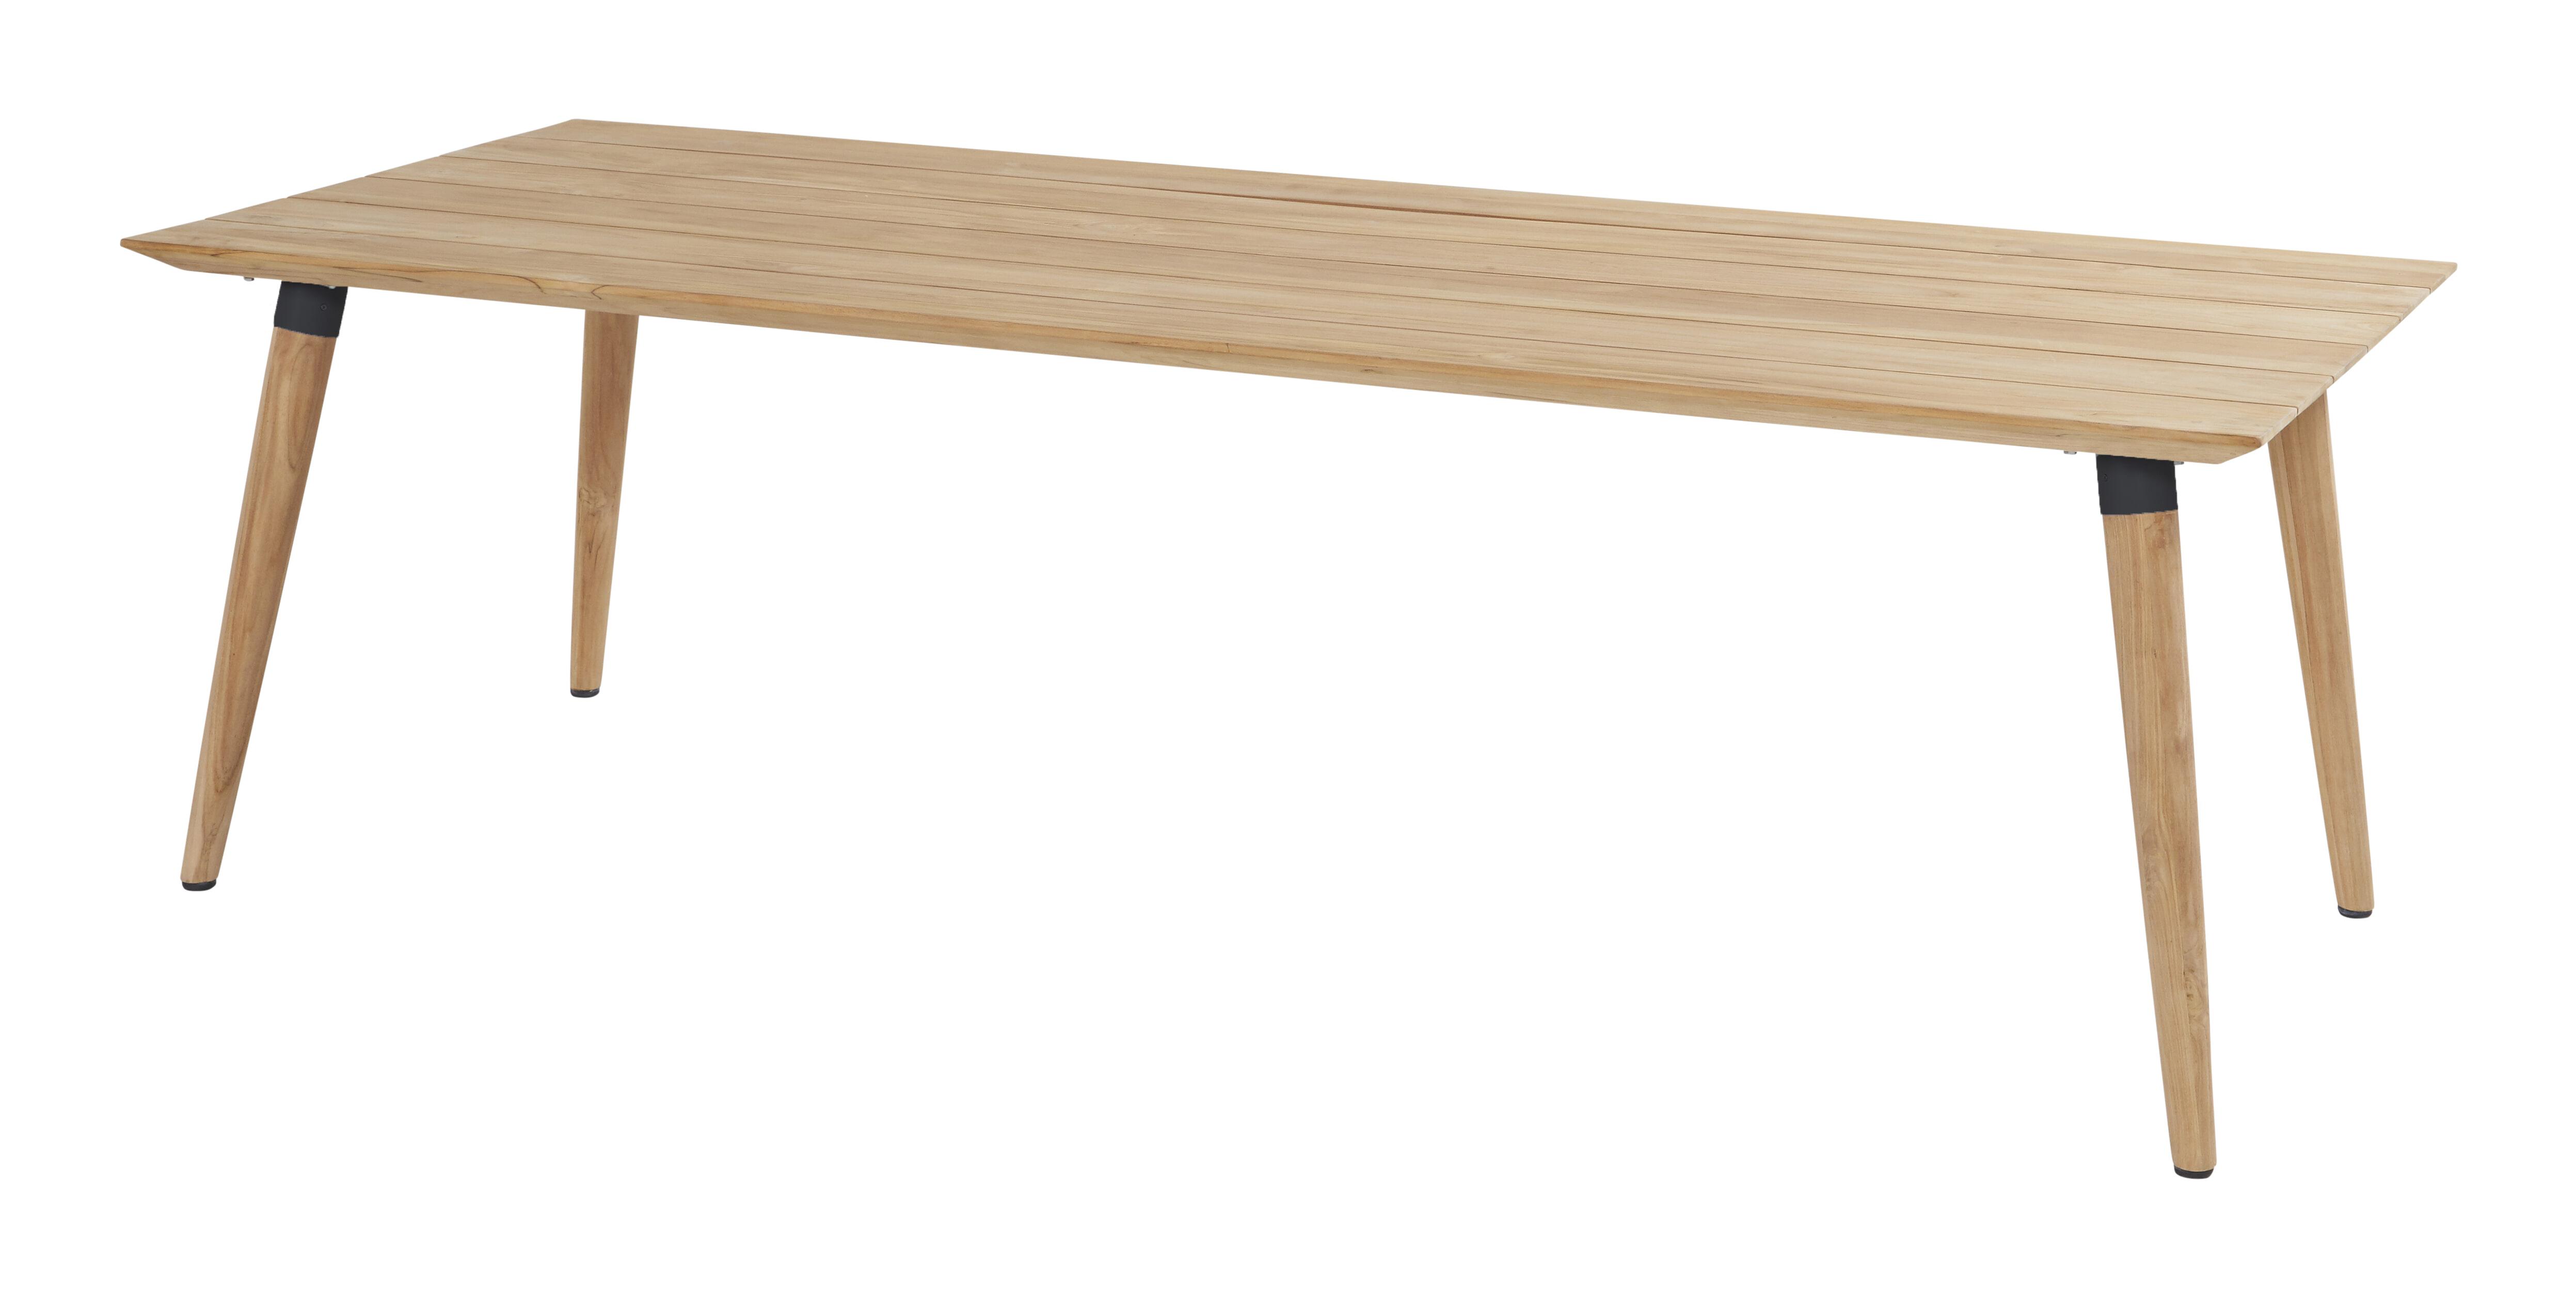 Hartman Tuintafel 'Sophie' Teak, 240 x 100cm, kleur Zwart